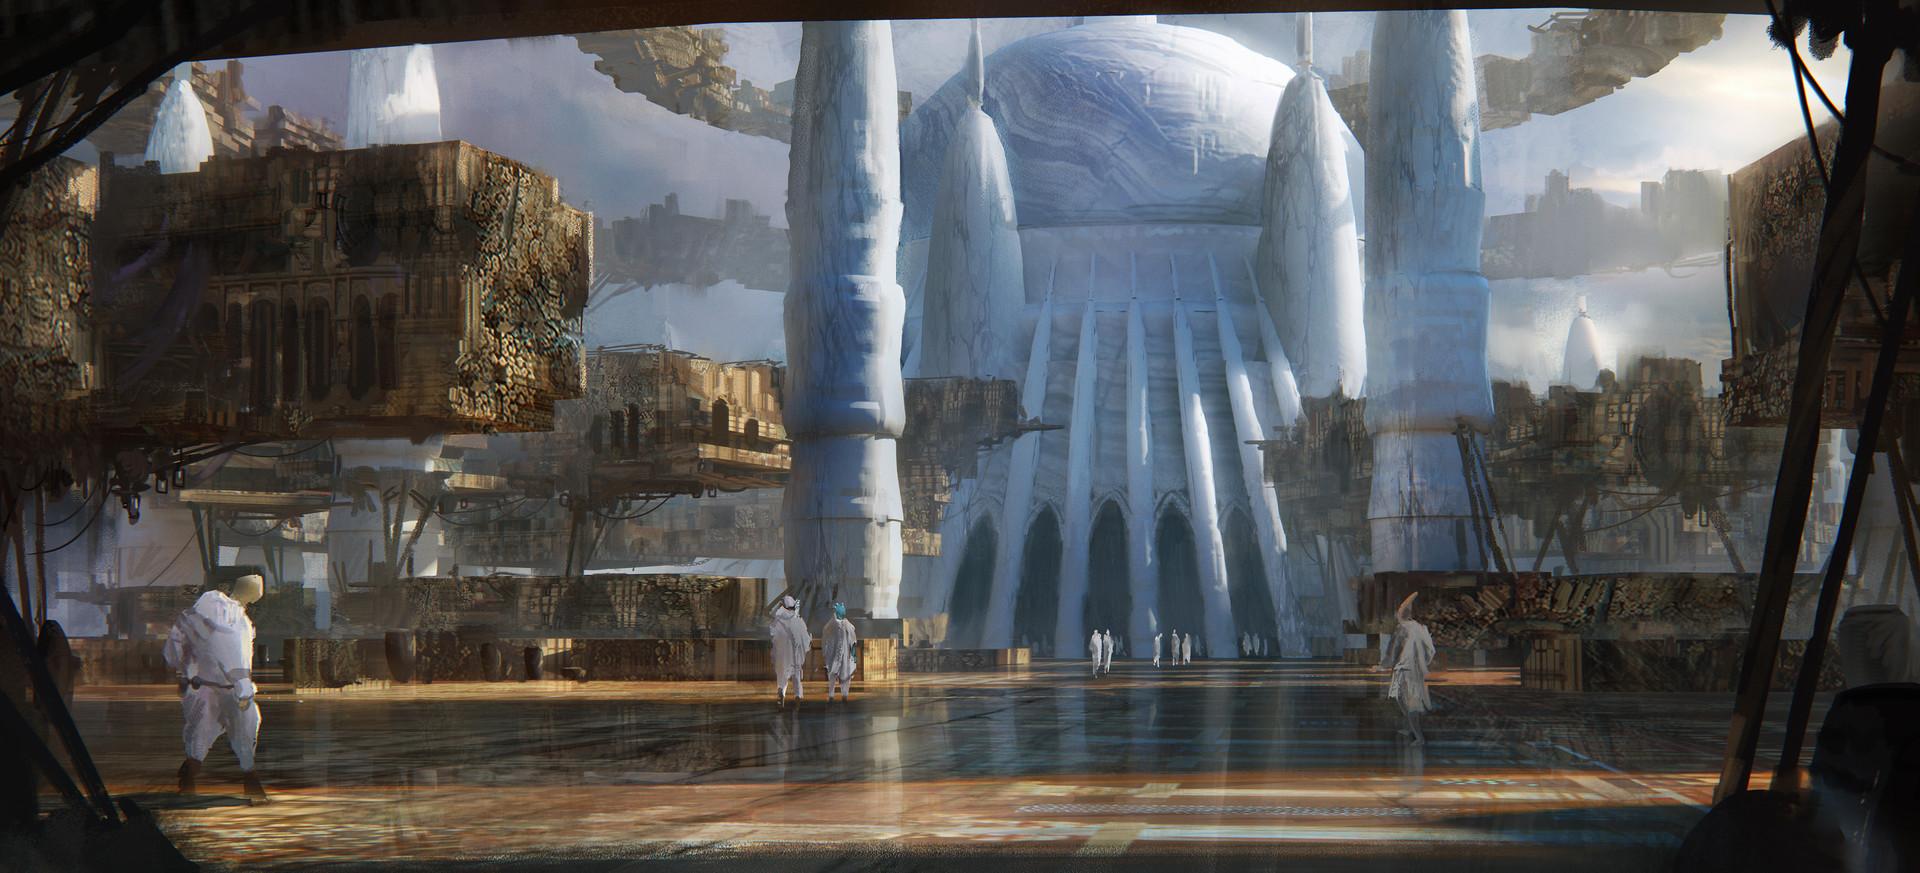 Leon tukker templefinisghedas